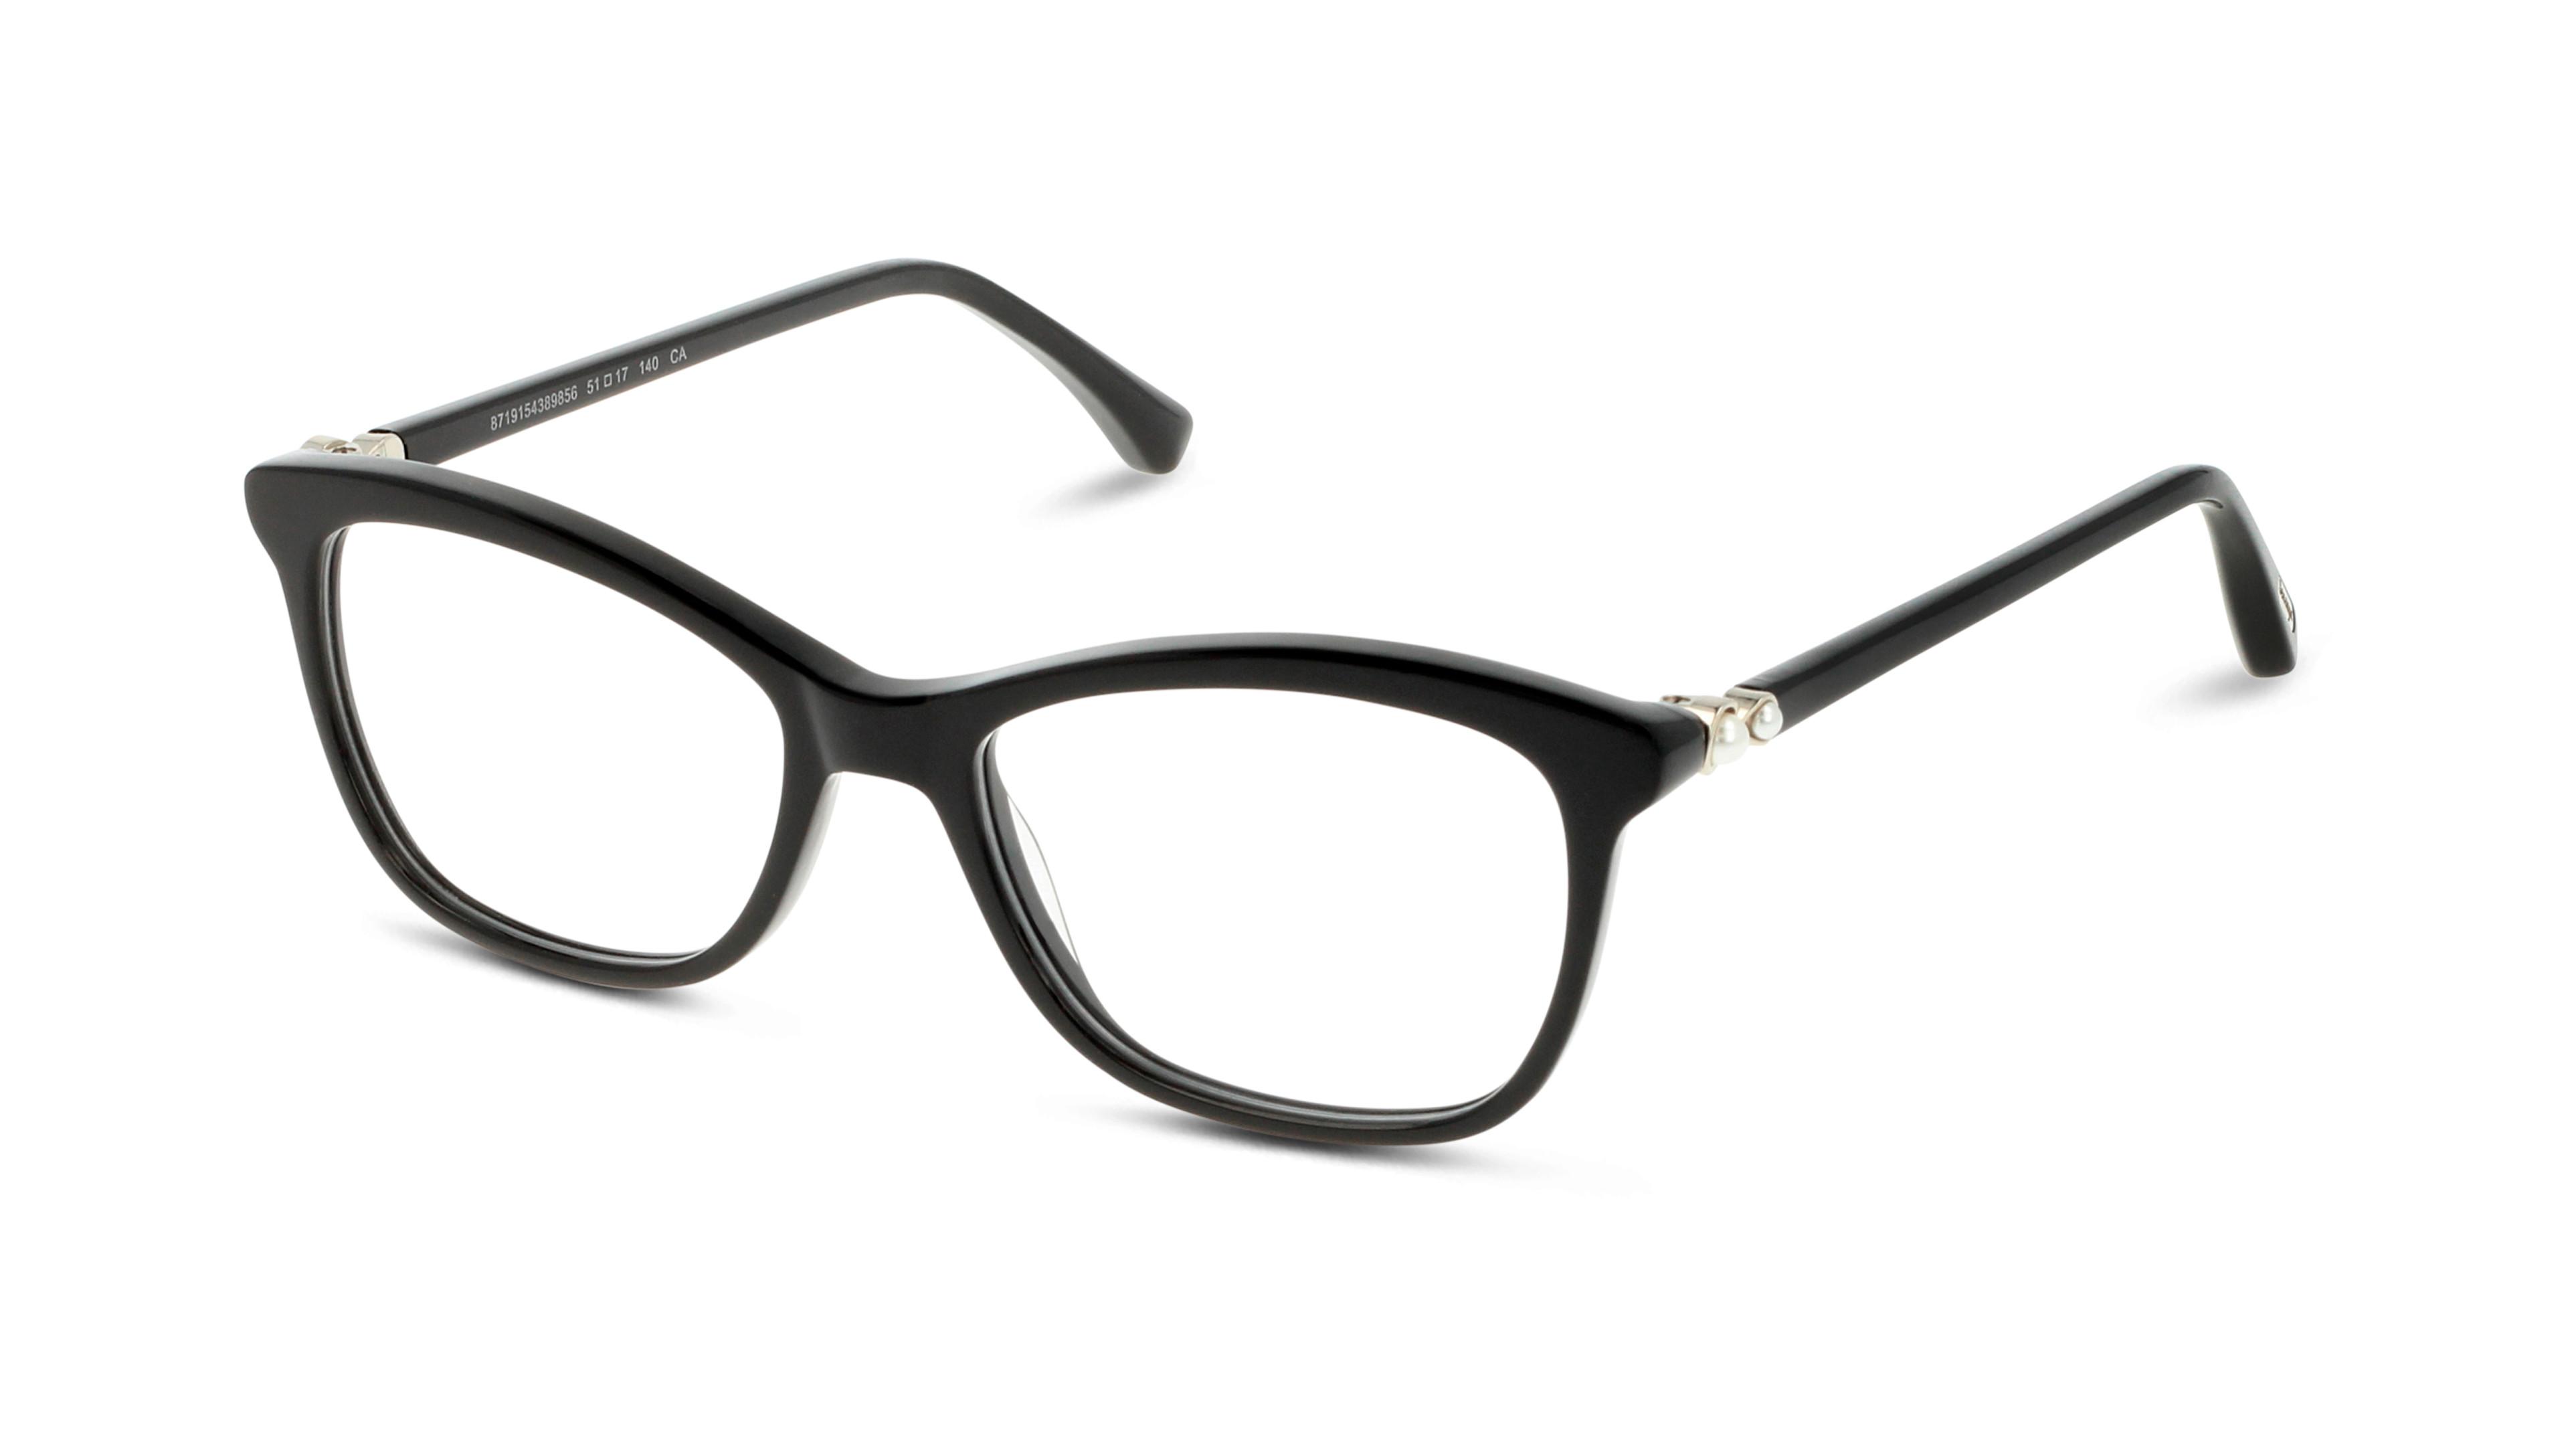 8719154625381-angle-01-sensaya-syhf40-eyewear-black-black